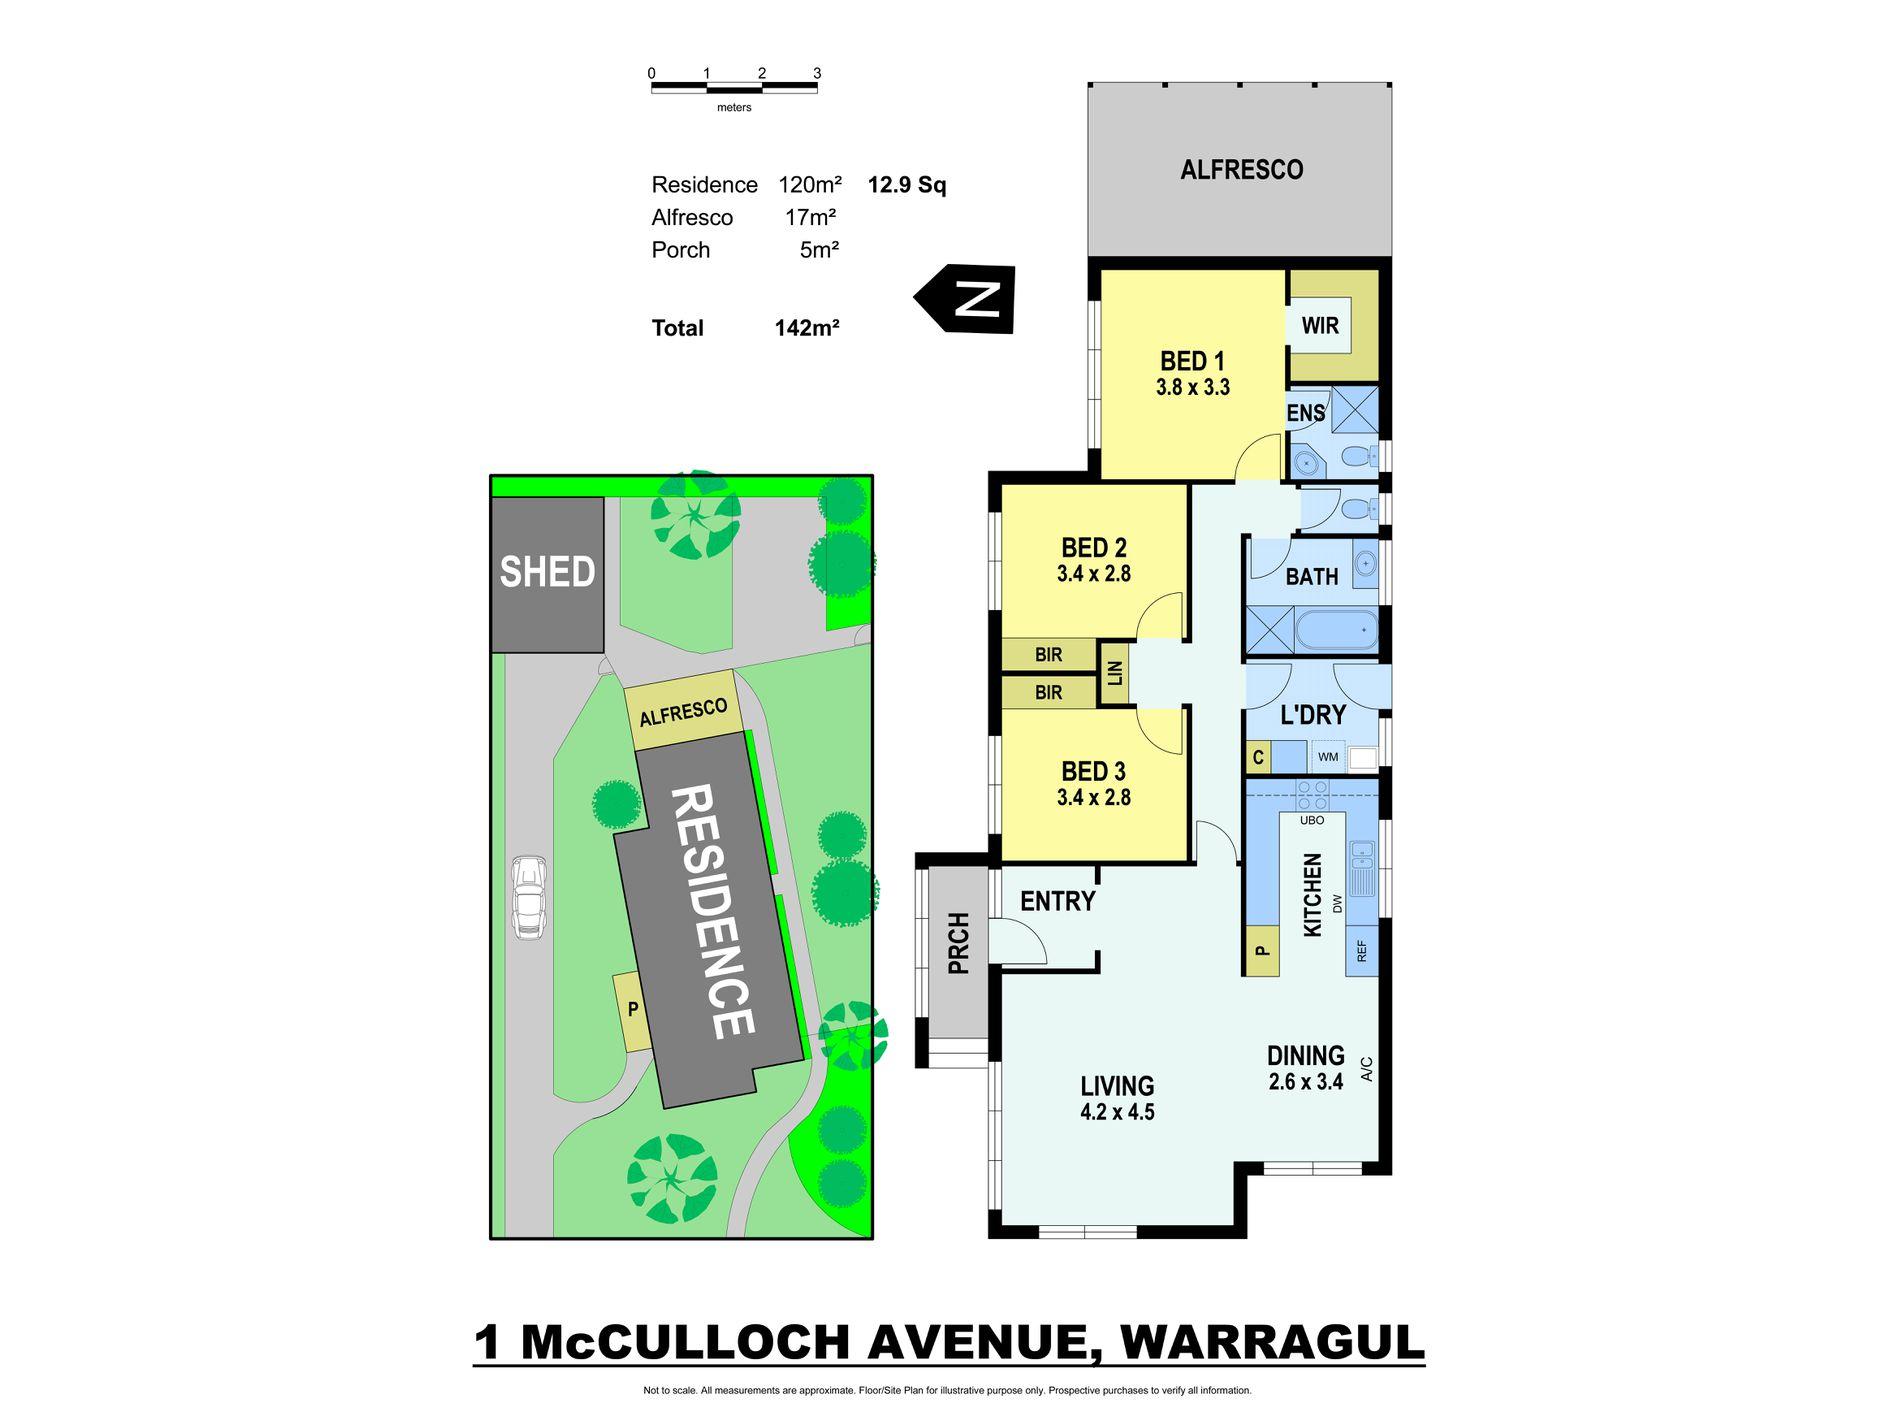 1 McCulloch Avenue, Warragul